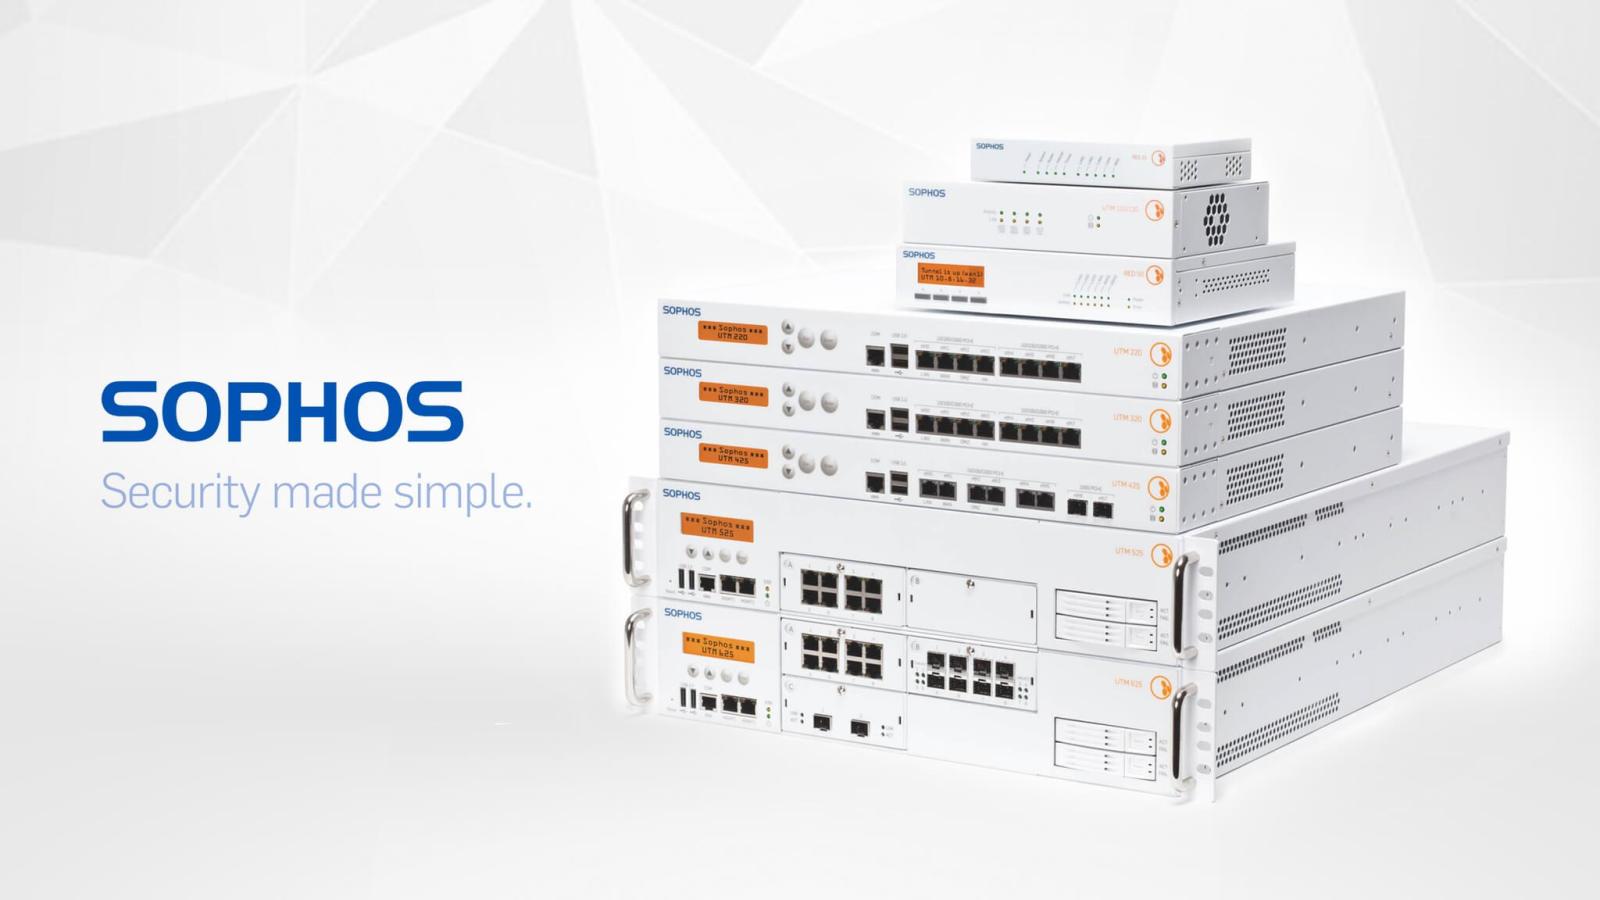 Sophos firewalls